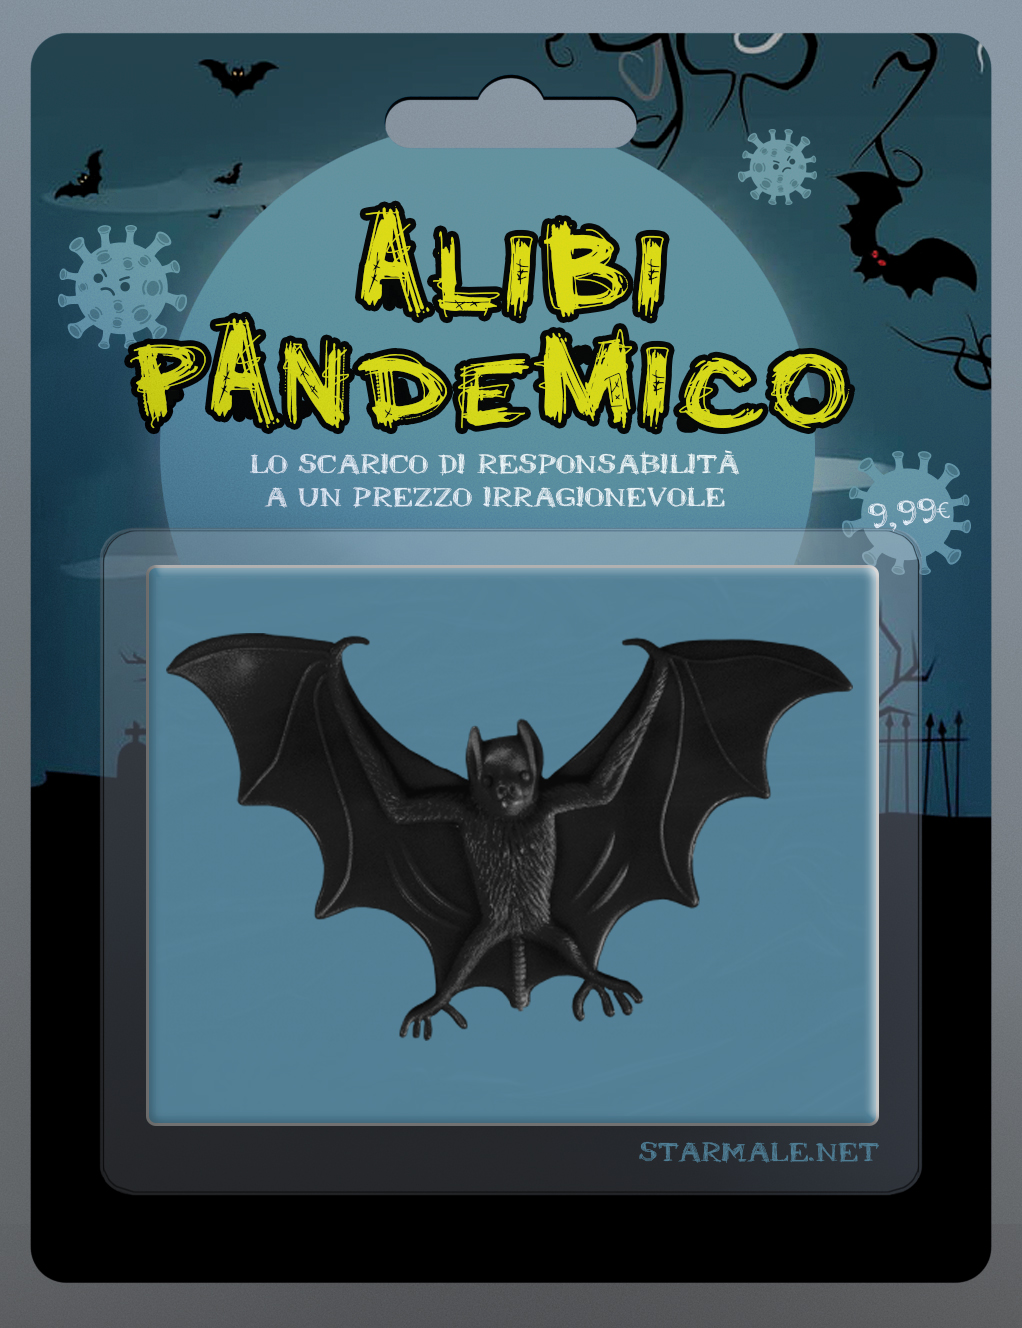 Alibi Pandemico